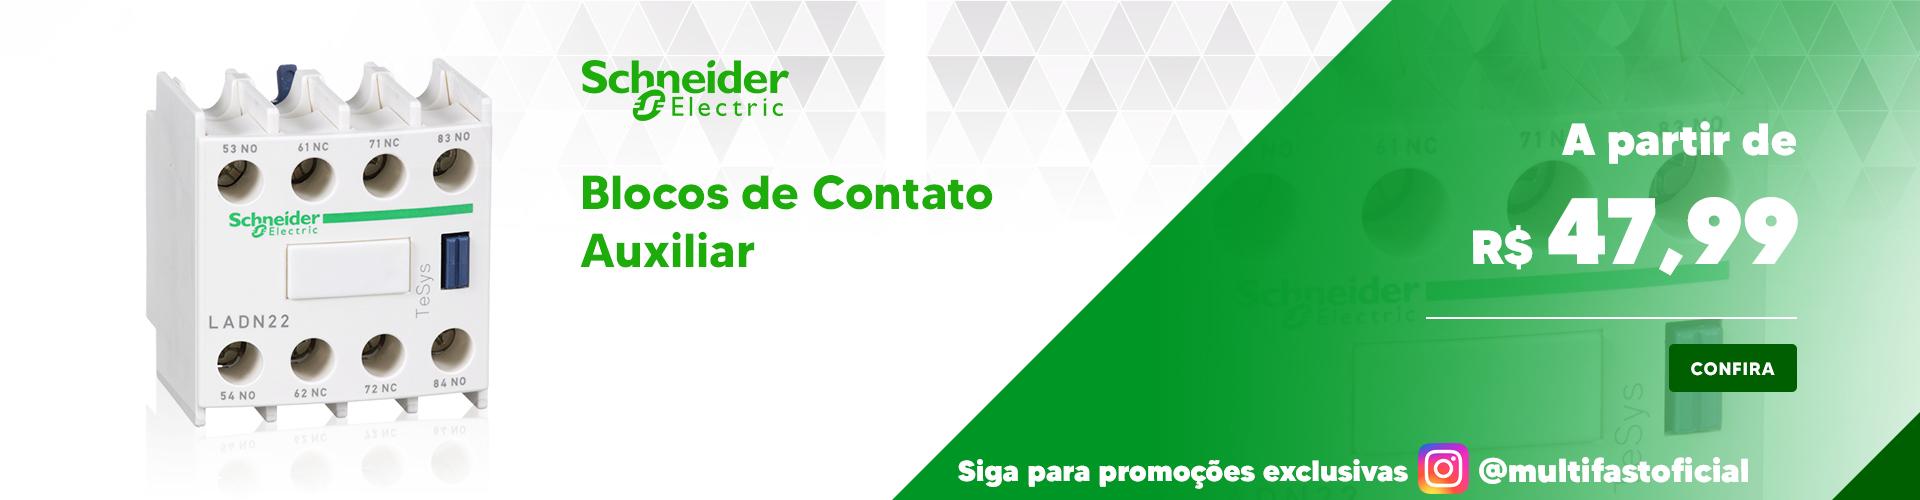 Banner Schneider Electric Bloco de Contato - Desktop